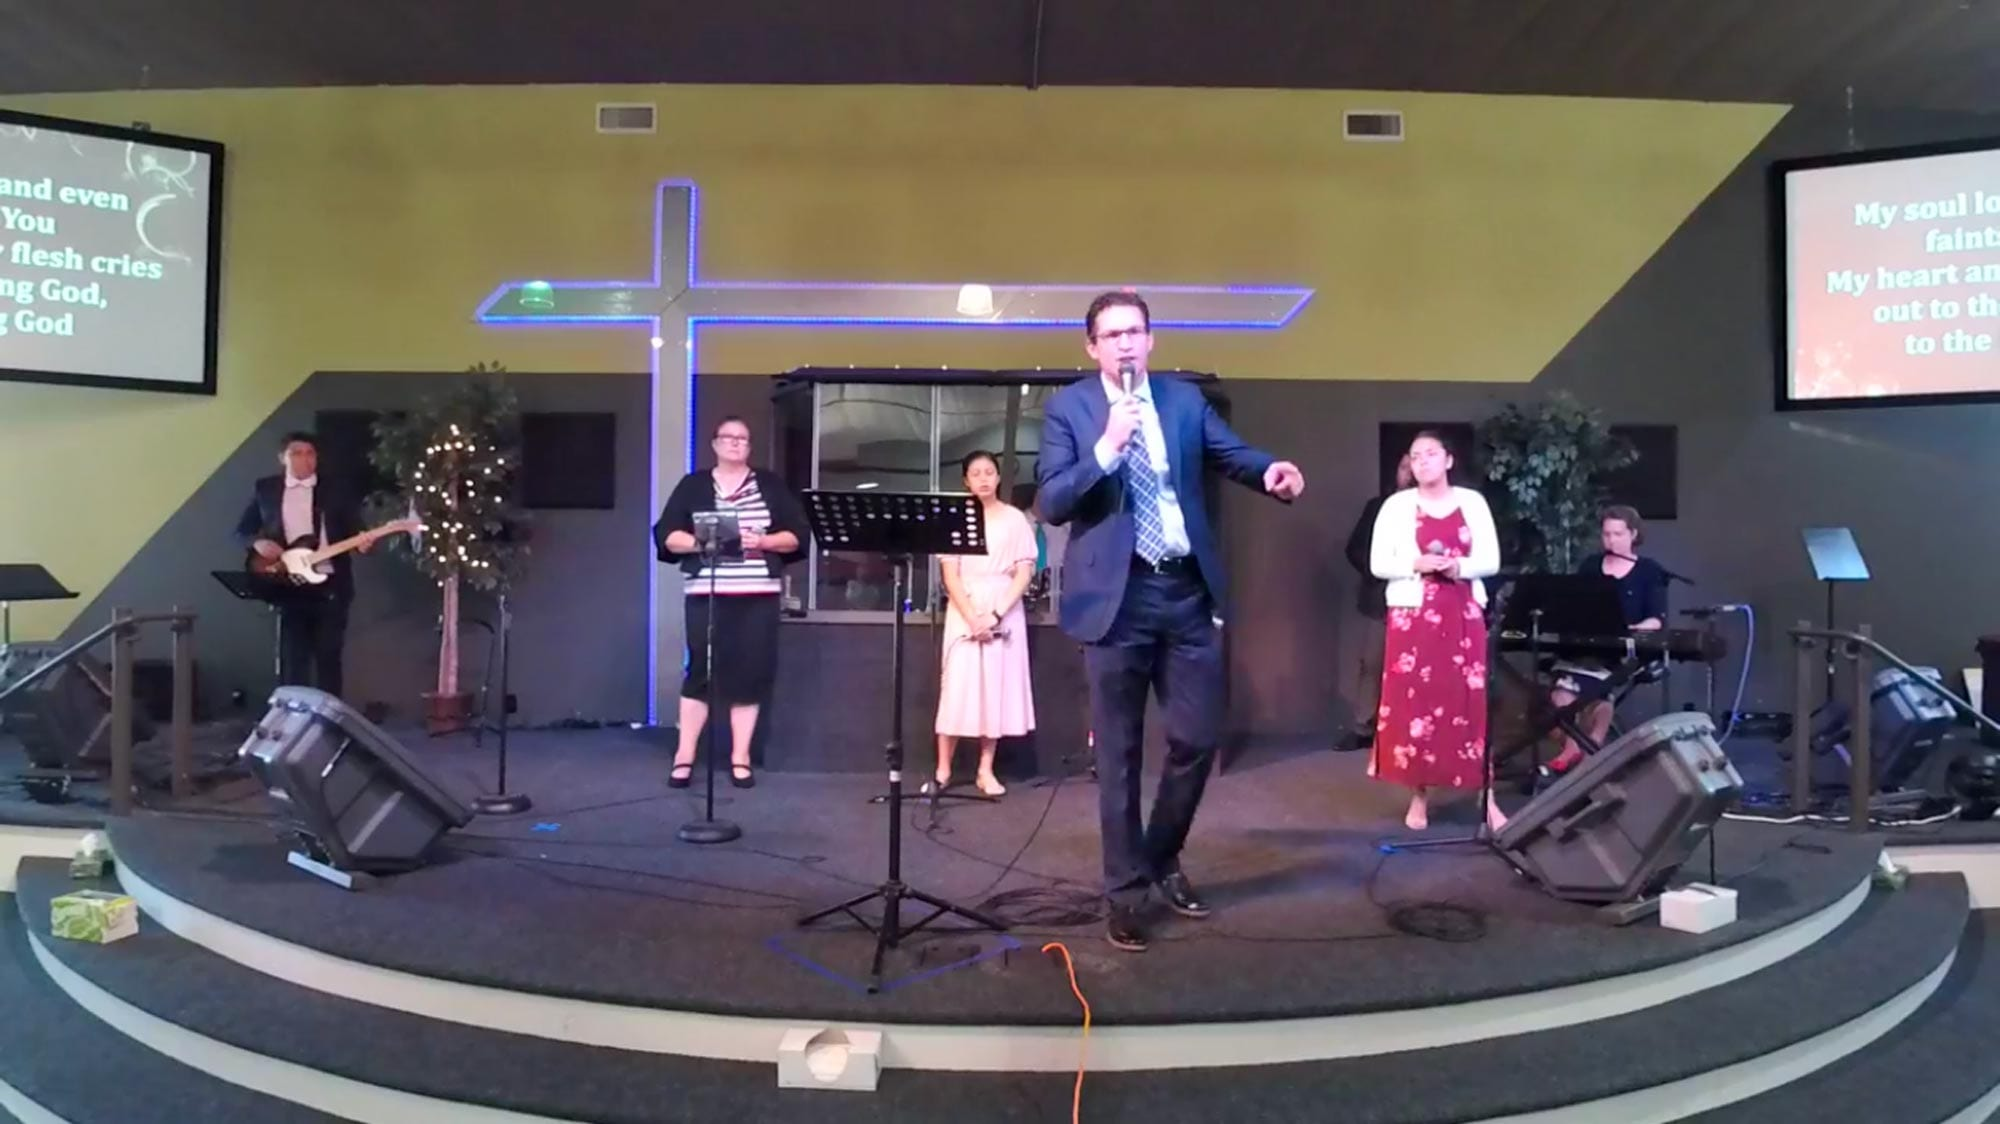 Joshua Vandevender preaching